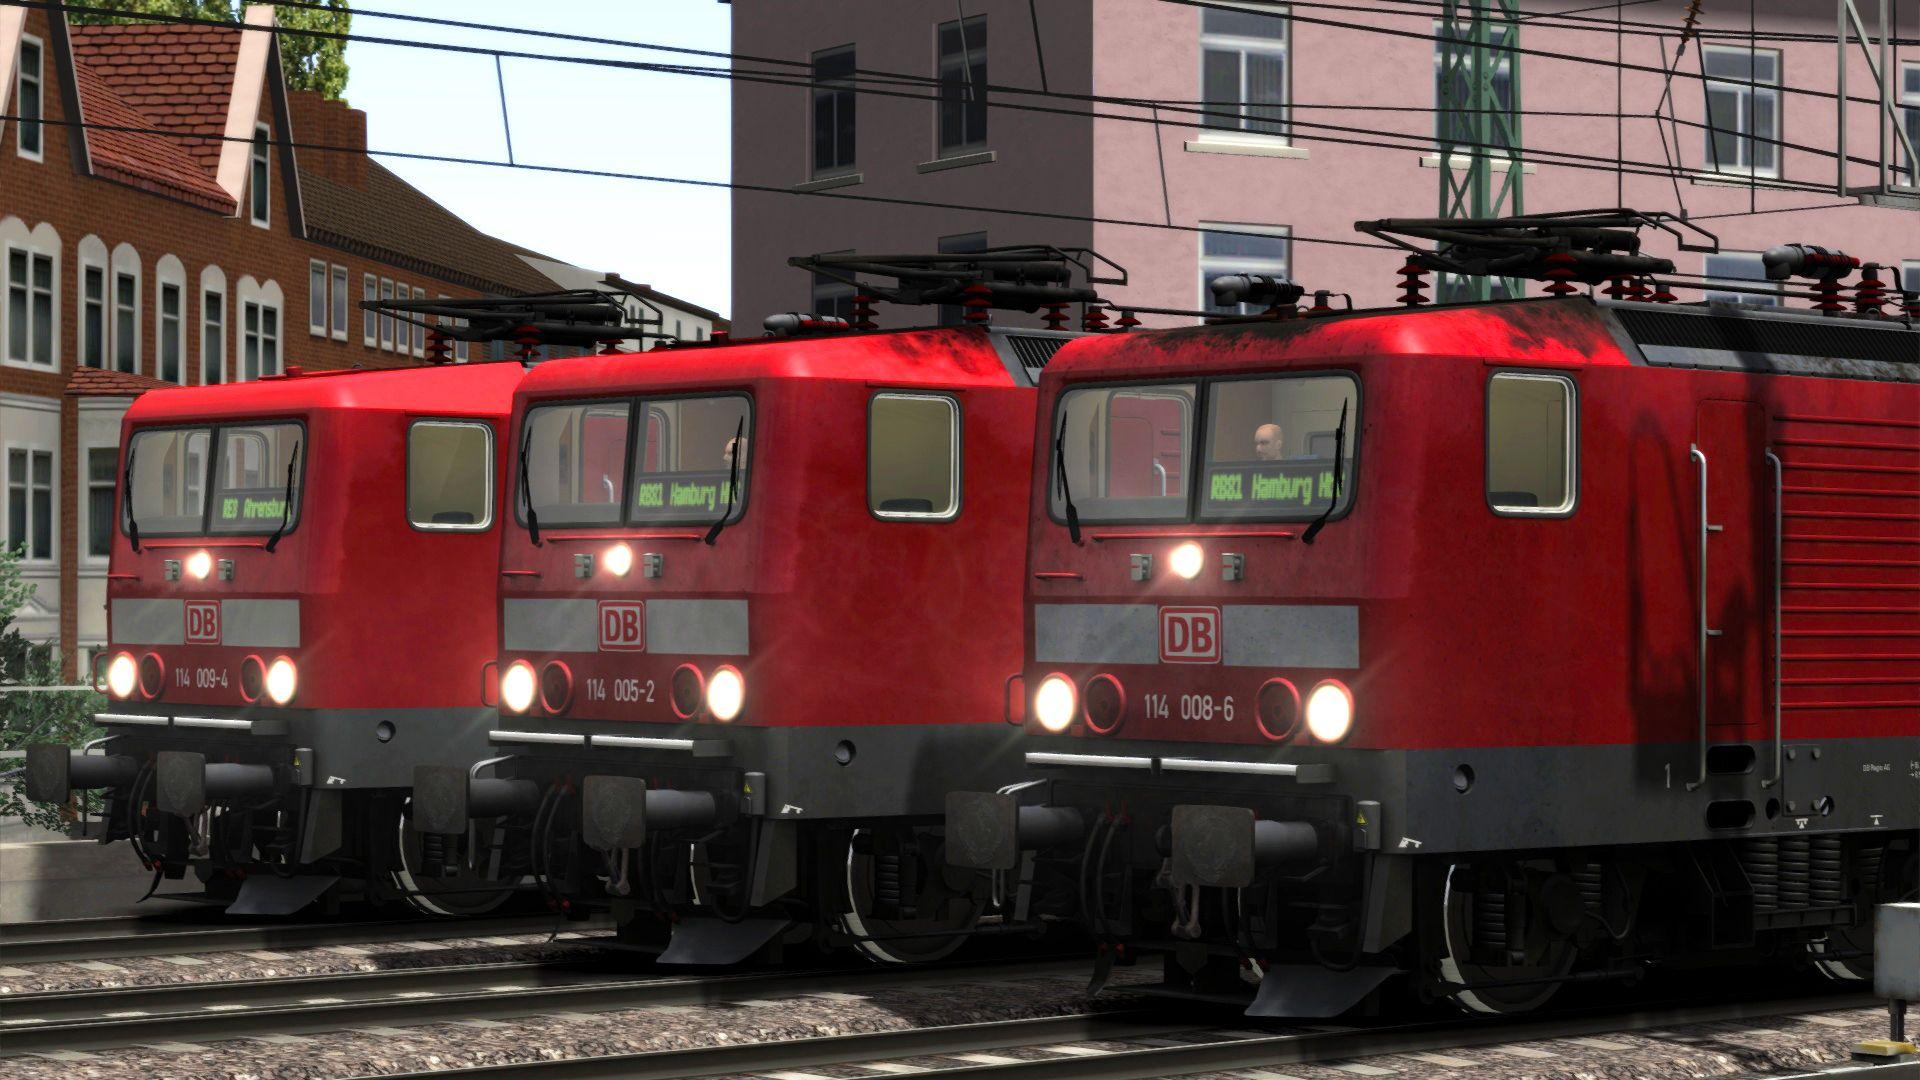 BR1144